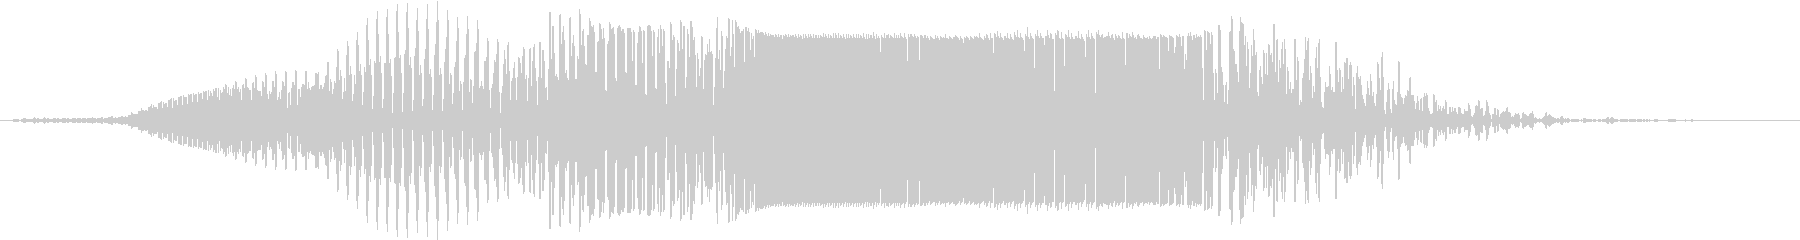 SF通過音01-03の未再生の波形